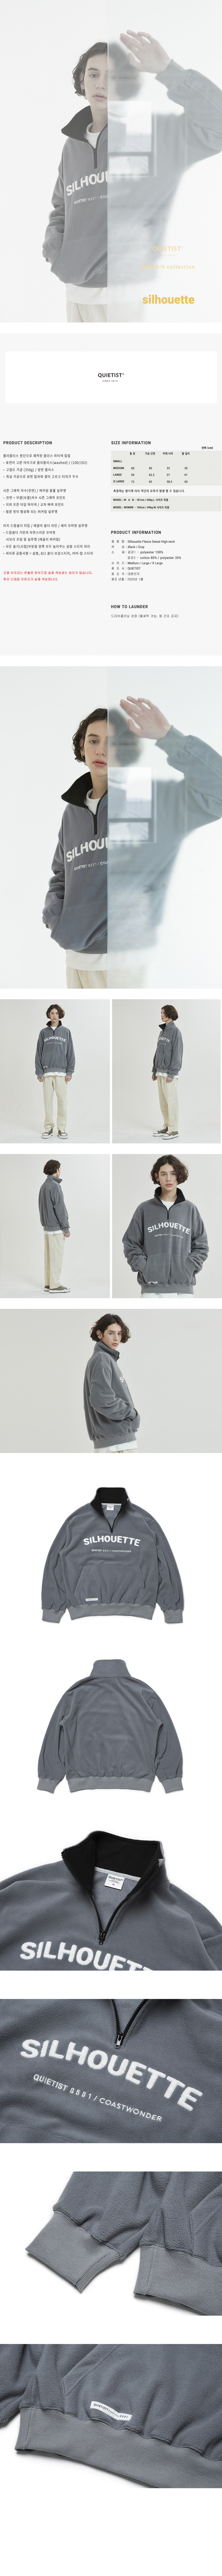 Silhouette Fleece Sweat High-neck (gray)